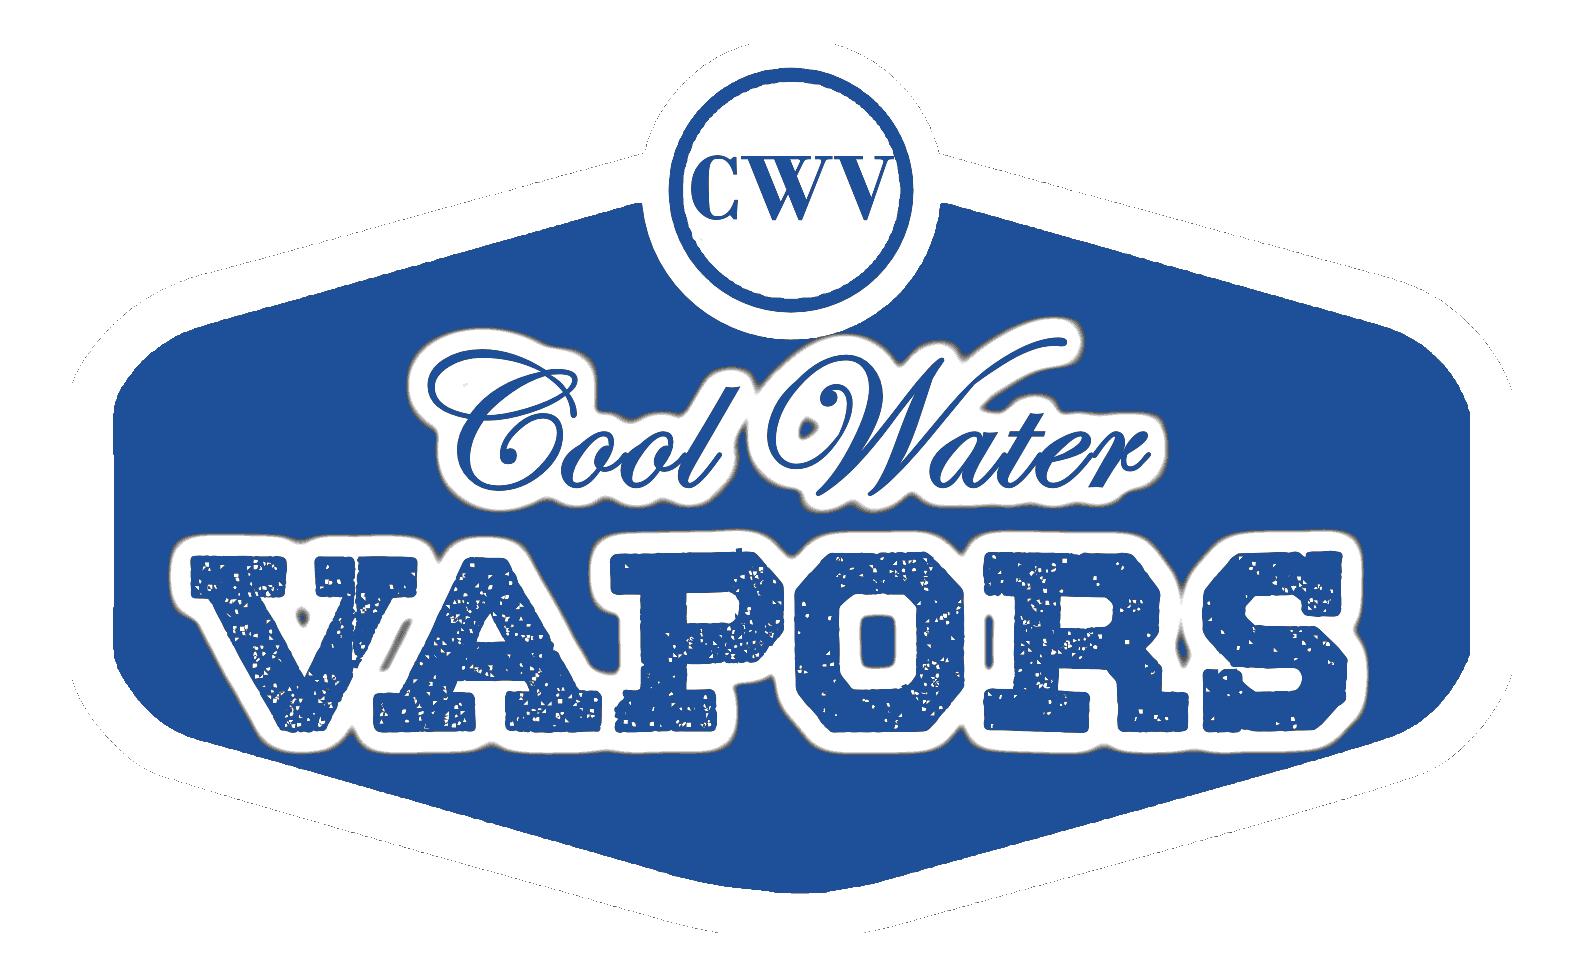 Cool Water Vapors & CBD